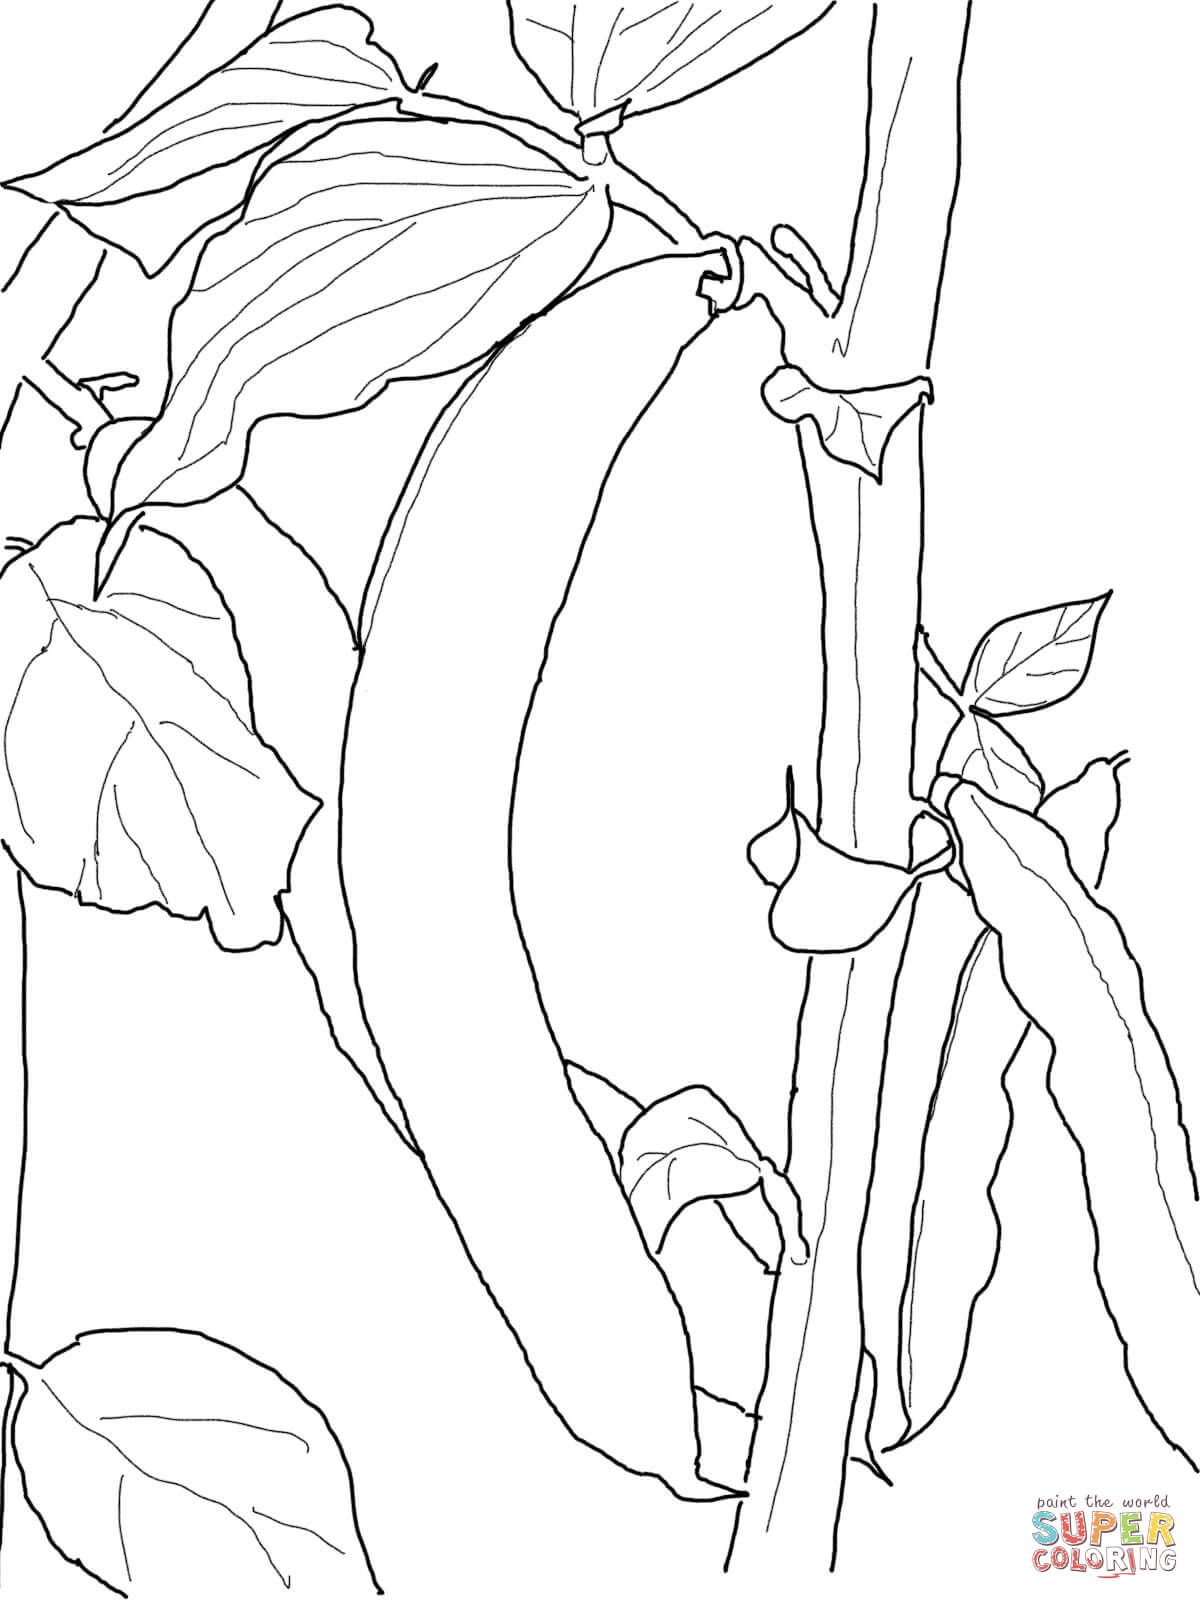 Beans coloring #6, Download drawings